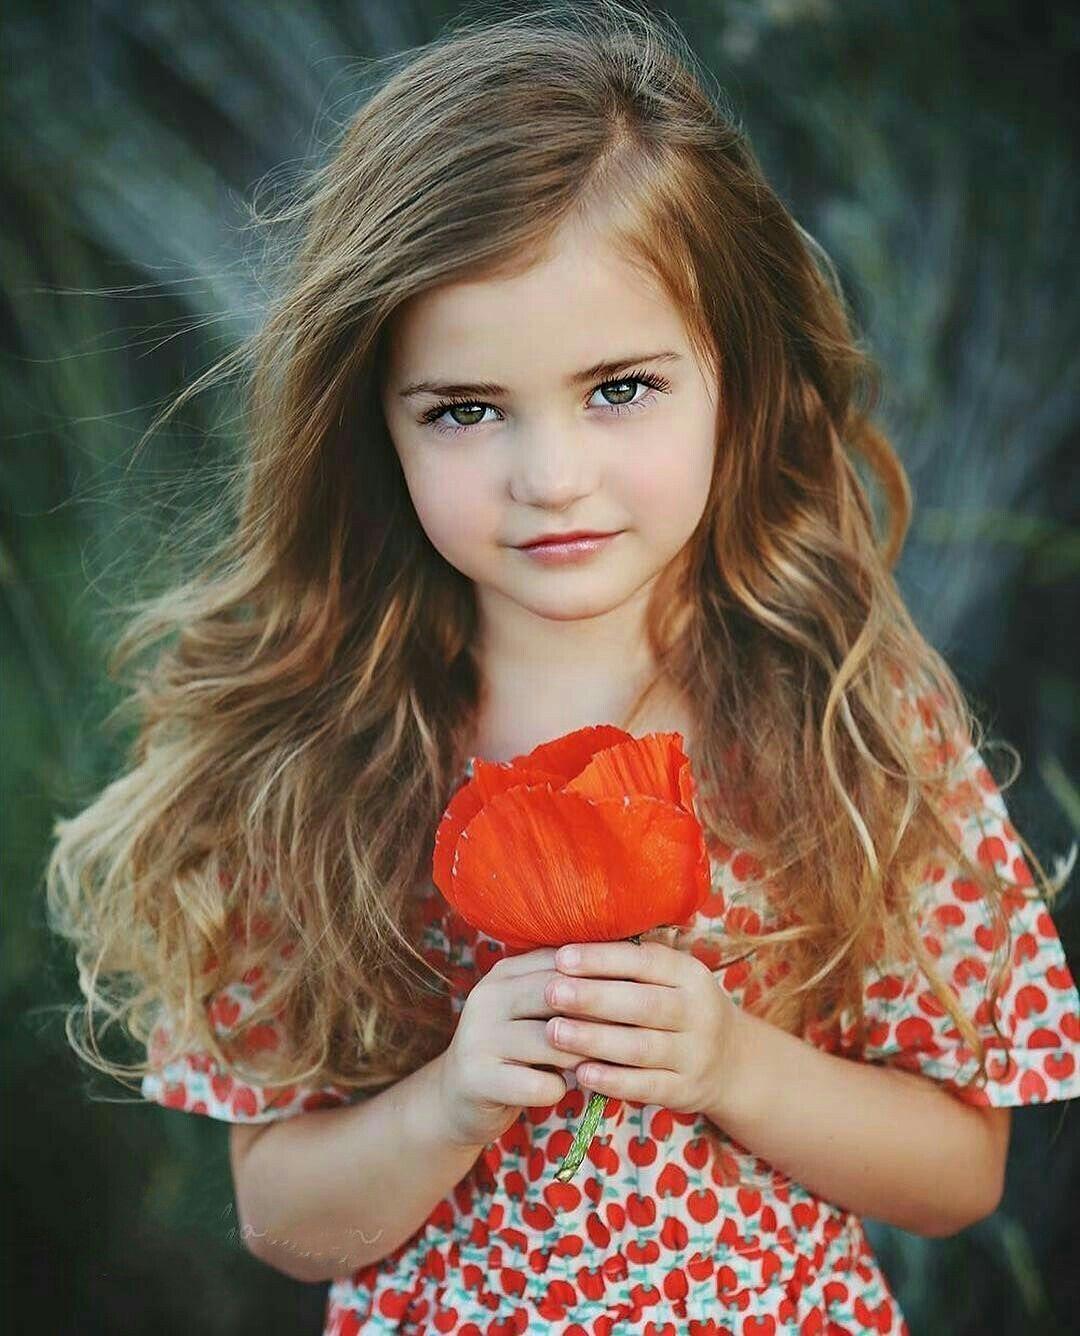 صور اطفال صور بيبي صور اولاد صور حلوين اطفال حلوينصور اطفال صغار2020 58